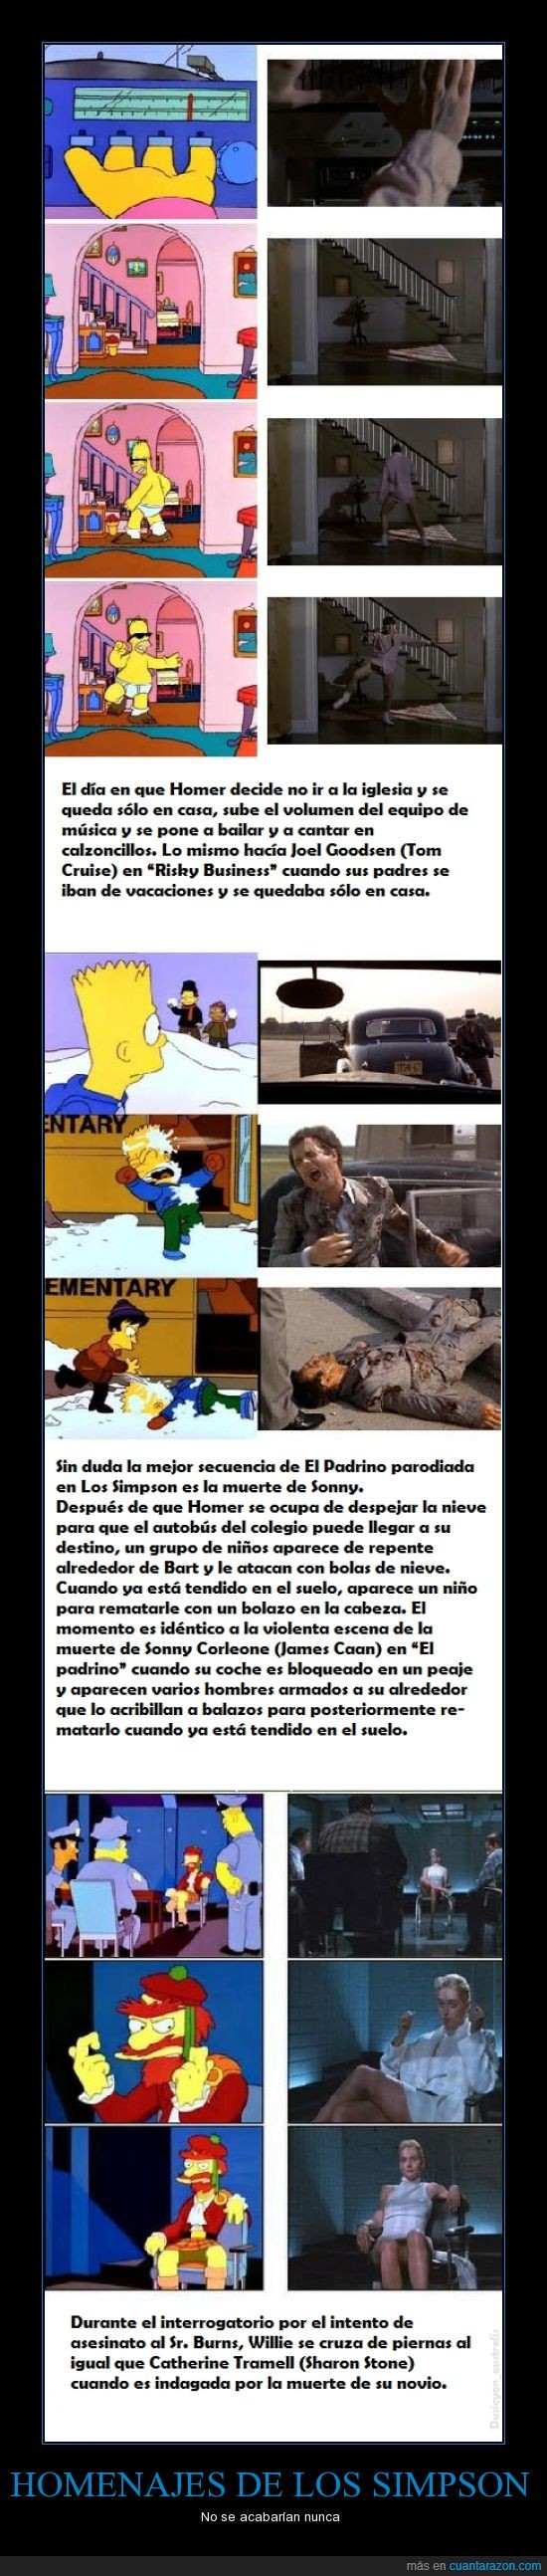 El Padrino,Los Simpson,parodias,Peliculas